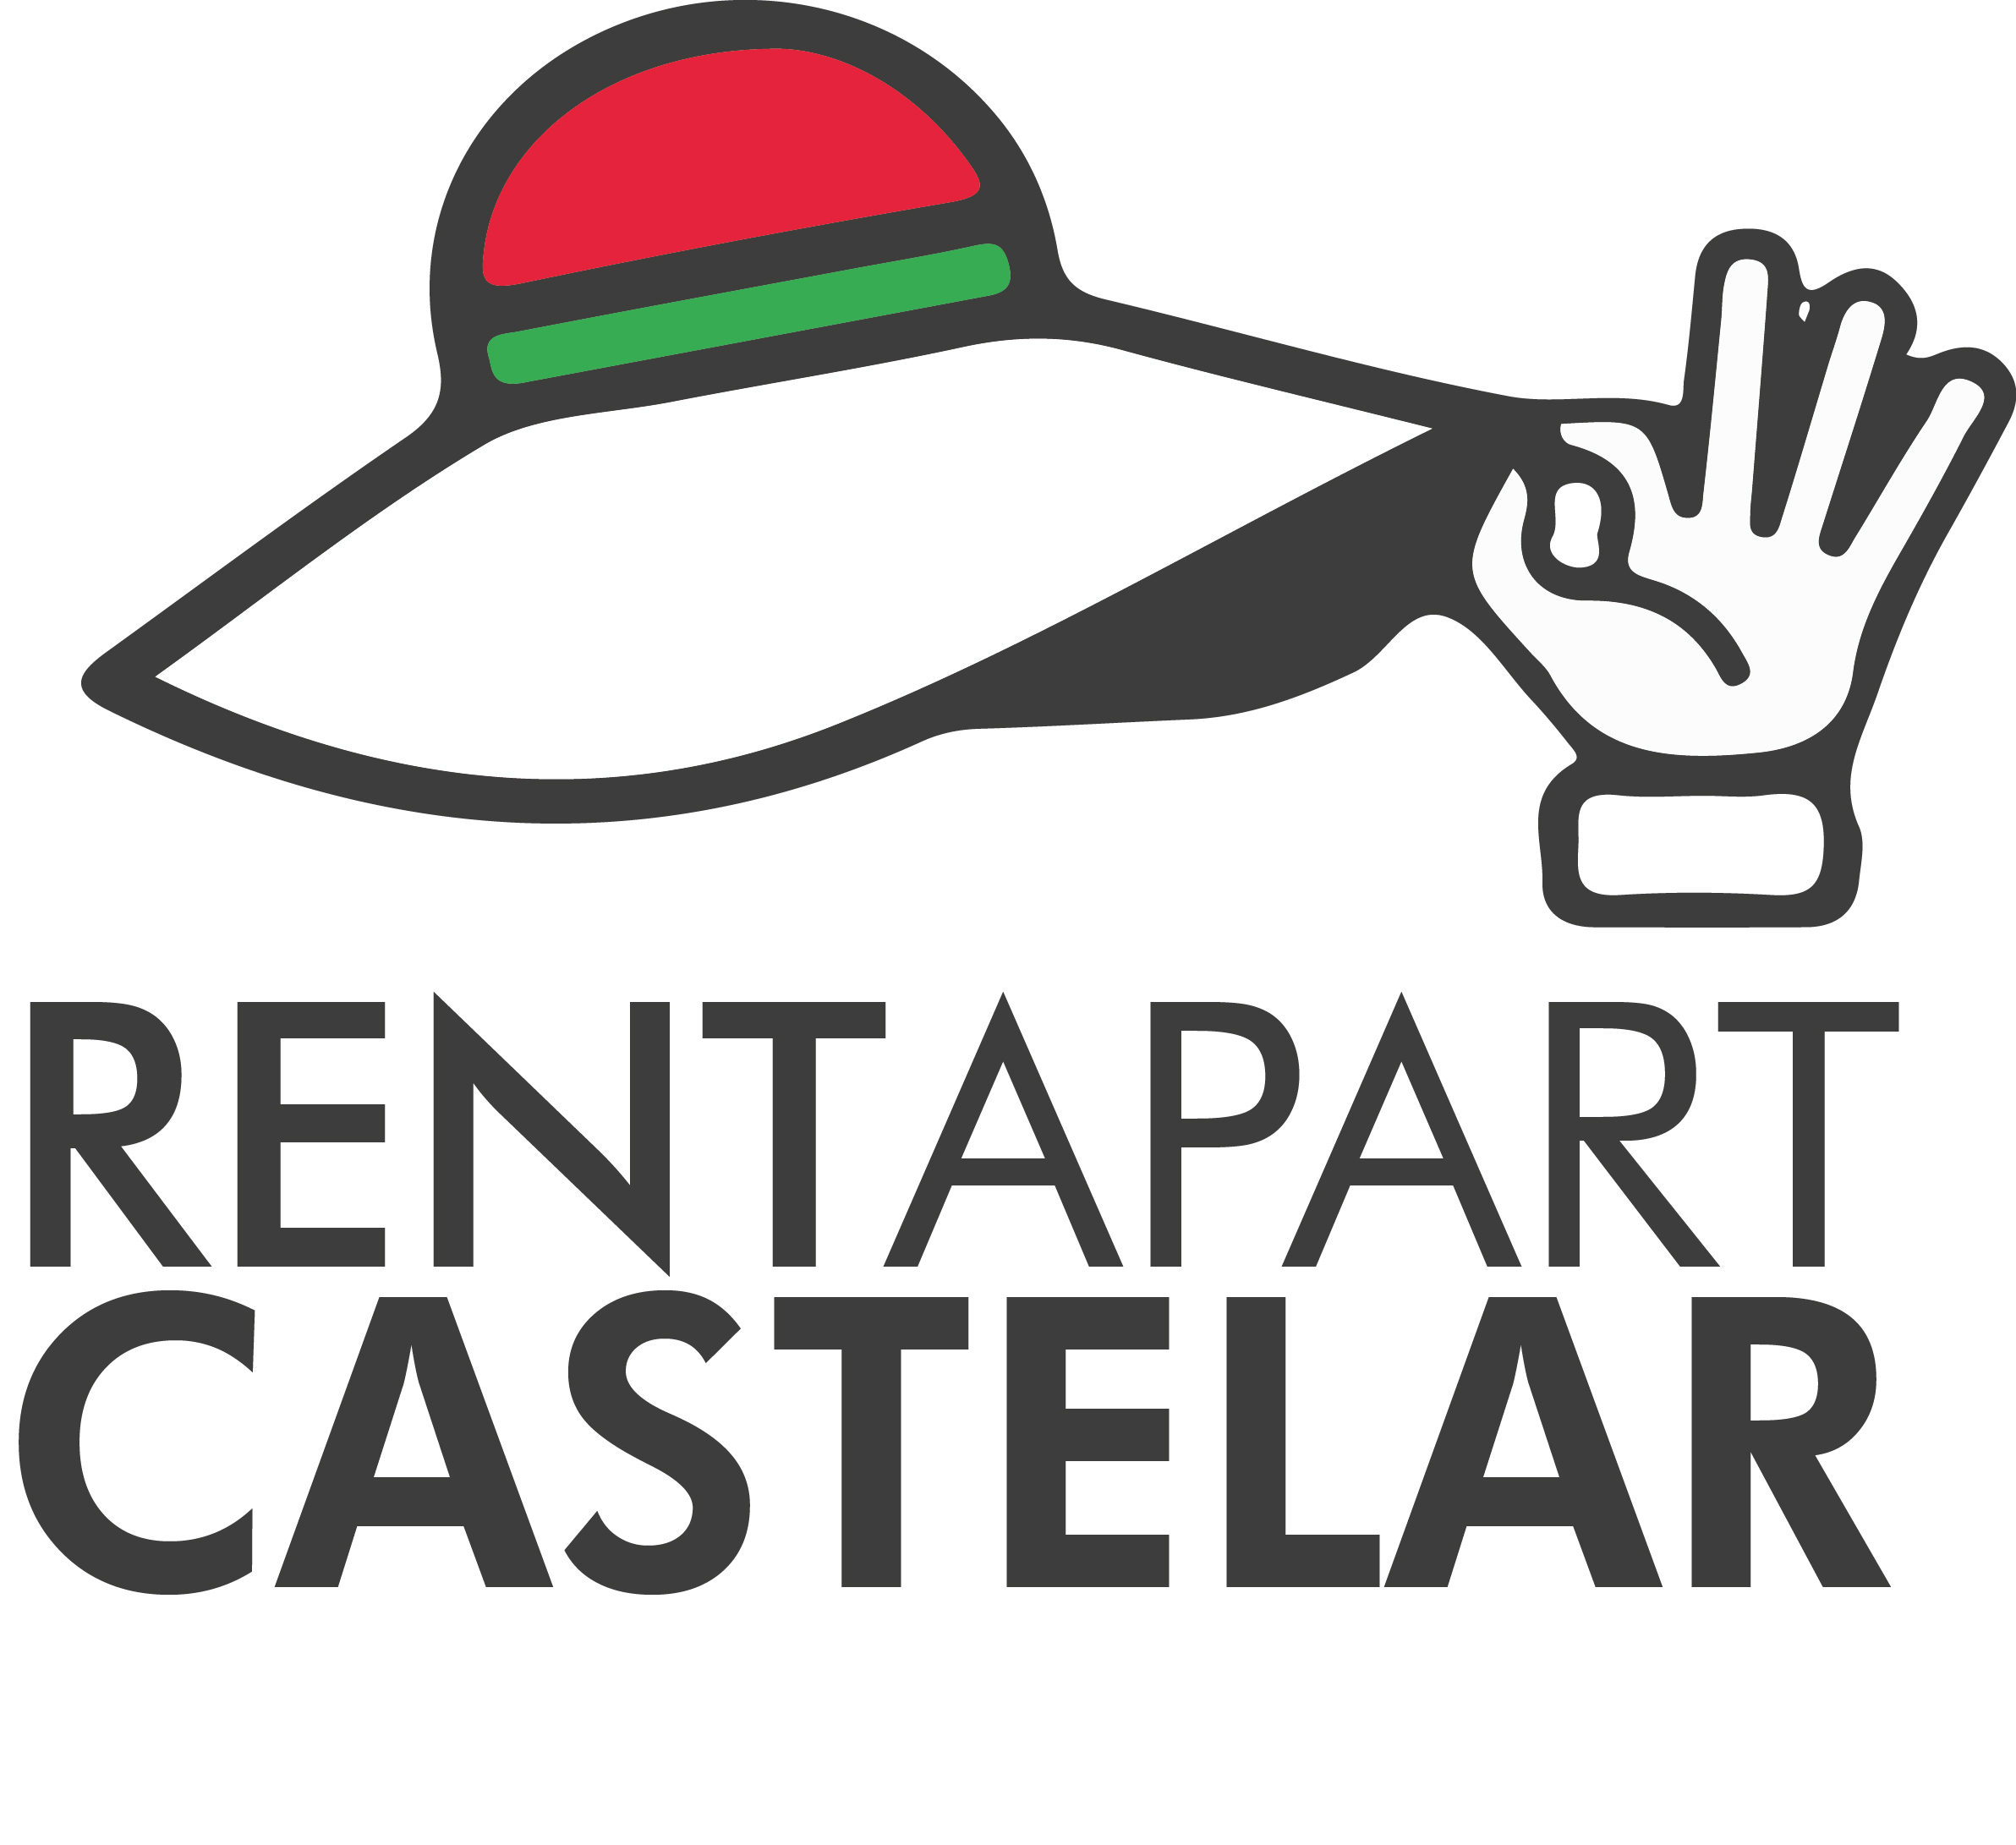 Castelar Rent Apart Logo